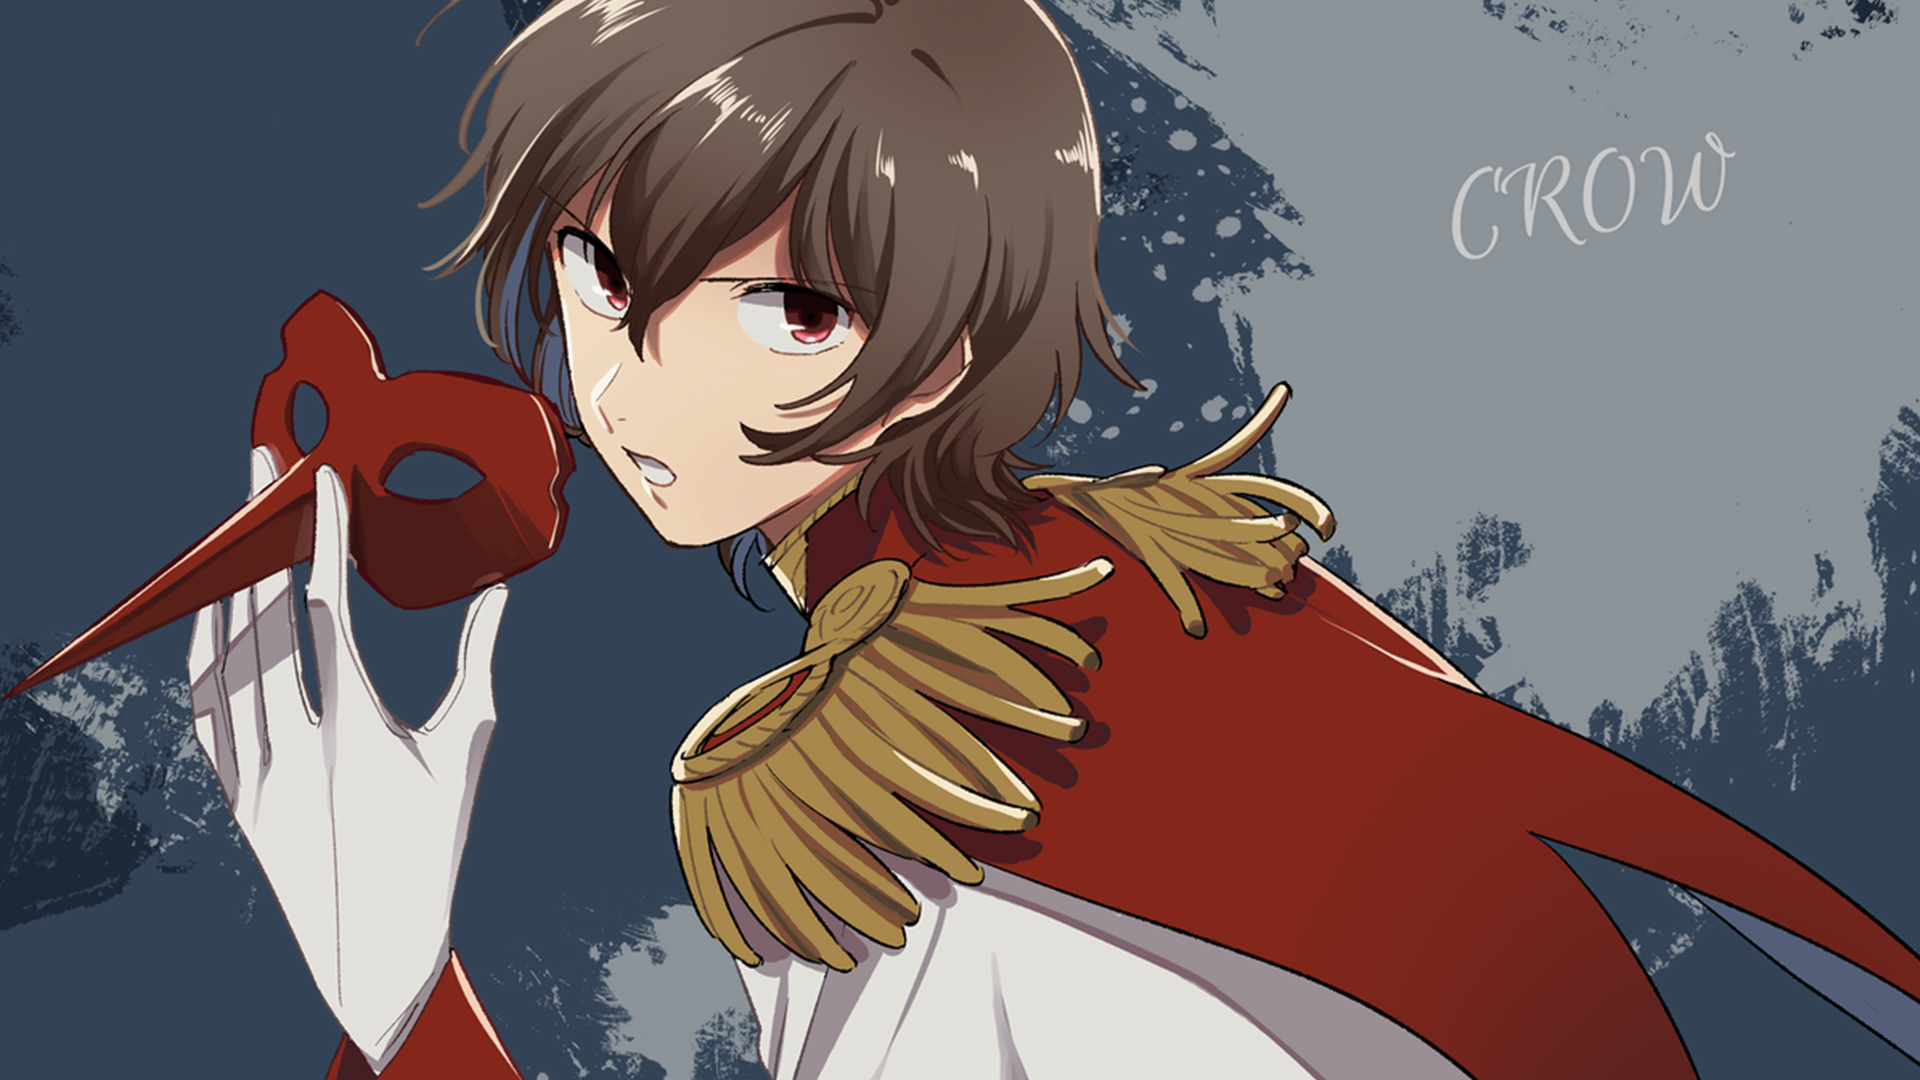 Persona 5   Goro Akechi HD Wallpaper Background Image 1920x1080